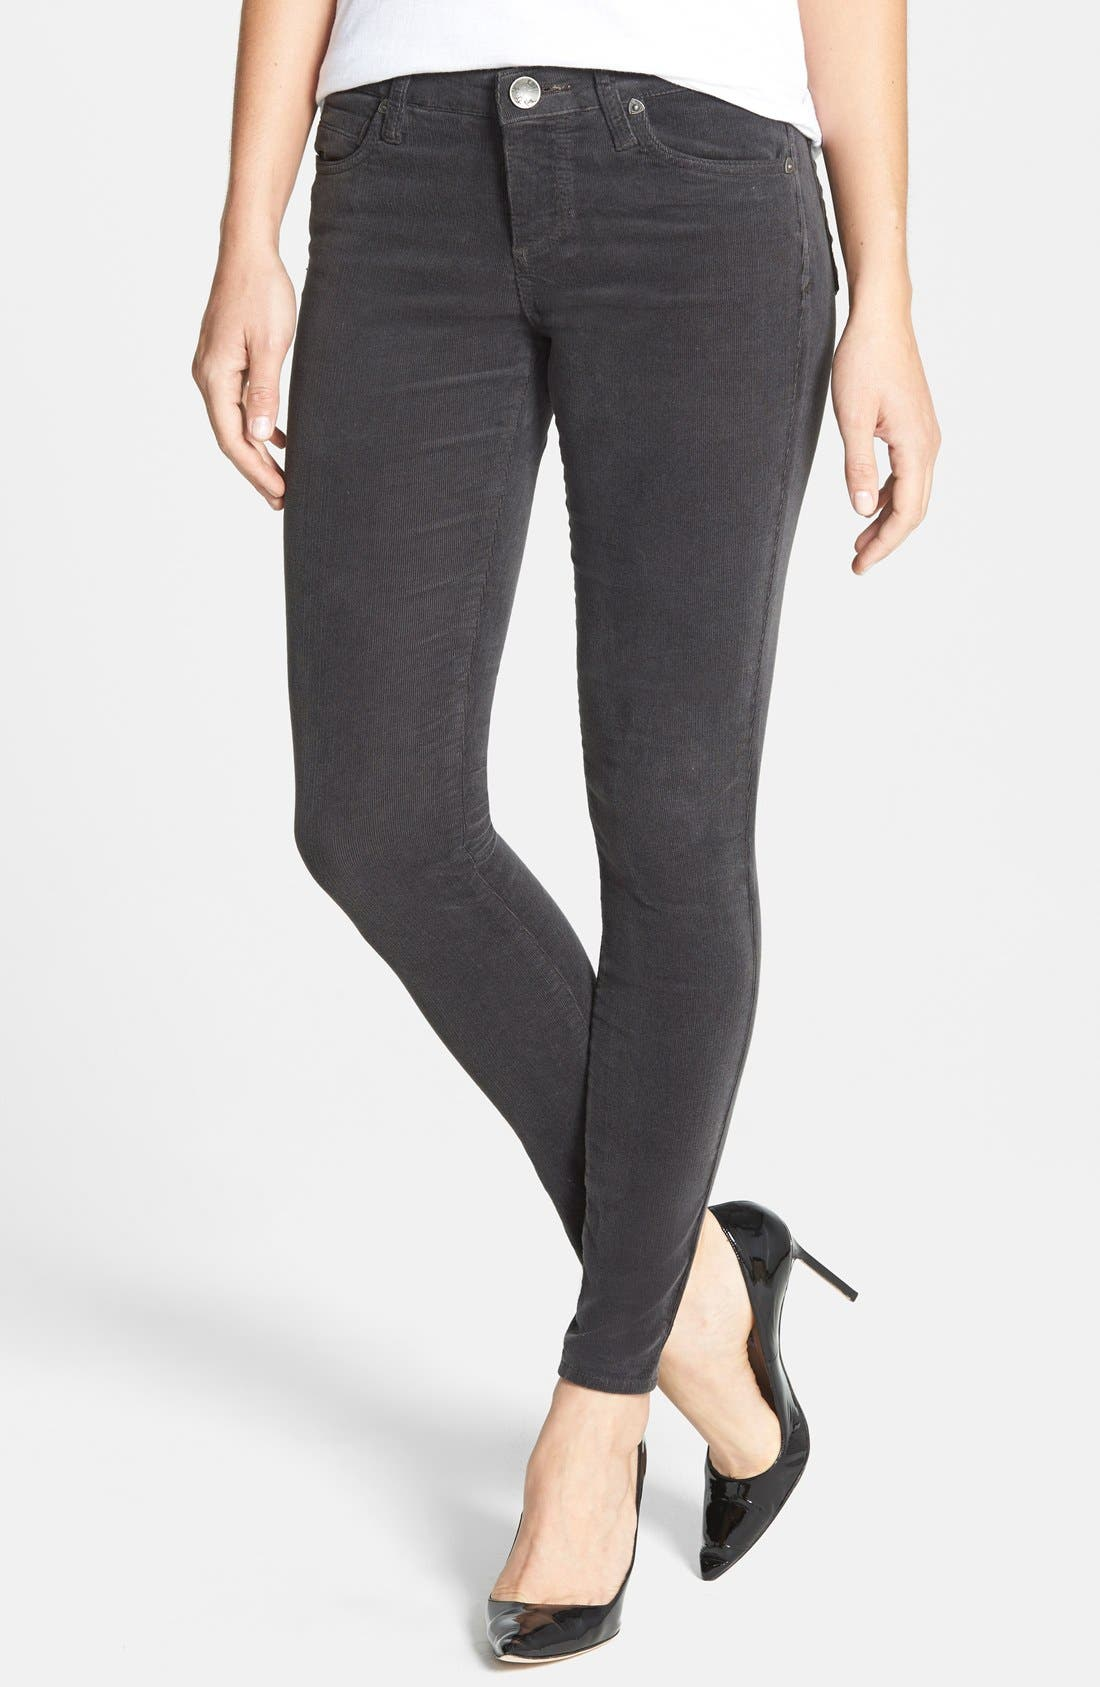 Alternate Image 1 Selected - KUT from the Kloth Diana Stretch Corduroy Skinny Pants (Regular & Petite)